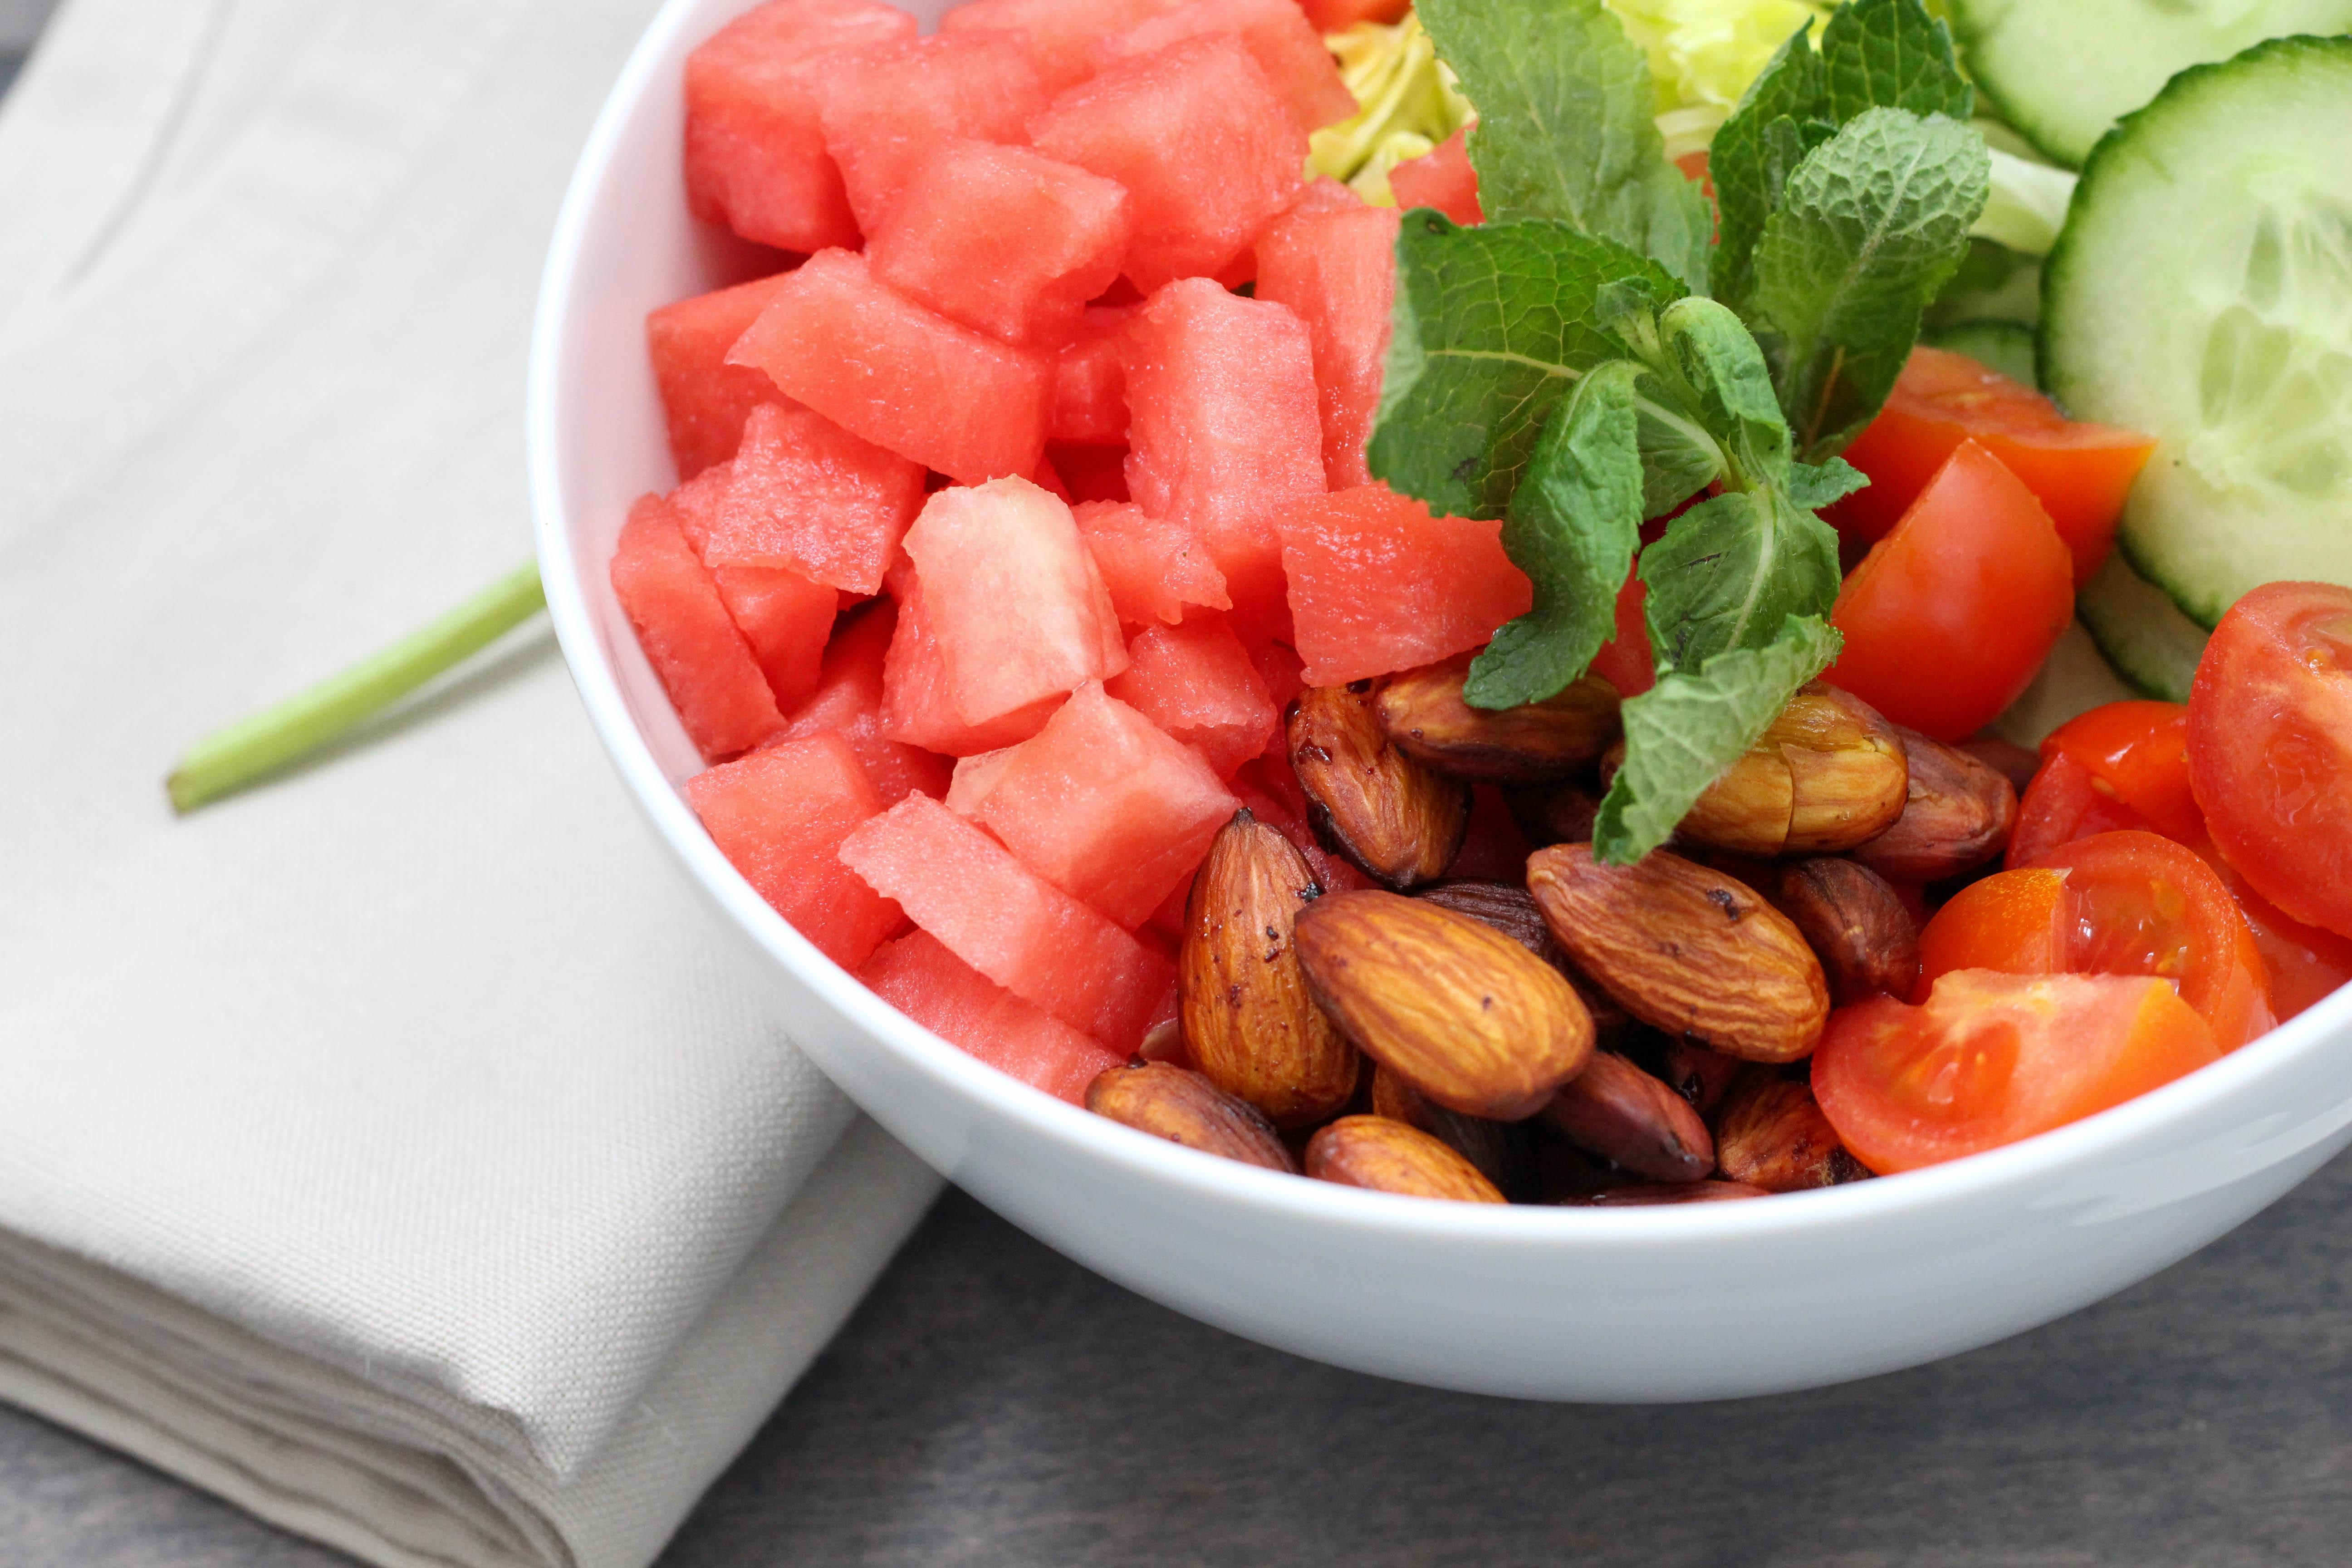 Homespa - Vegan - Wassermelonen - Bowl - Balsamico Dressing - Minze - Rauchmandeln-Clean Eating, Powerfood,